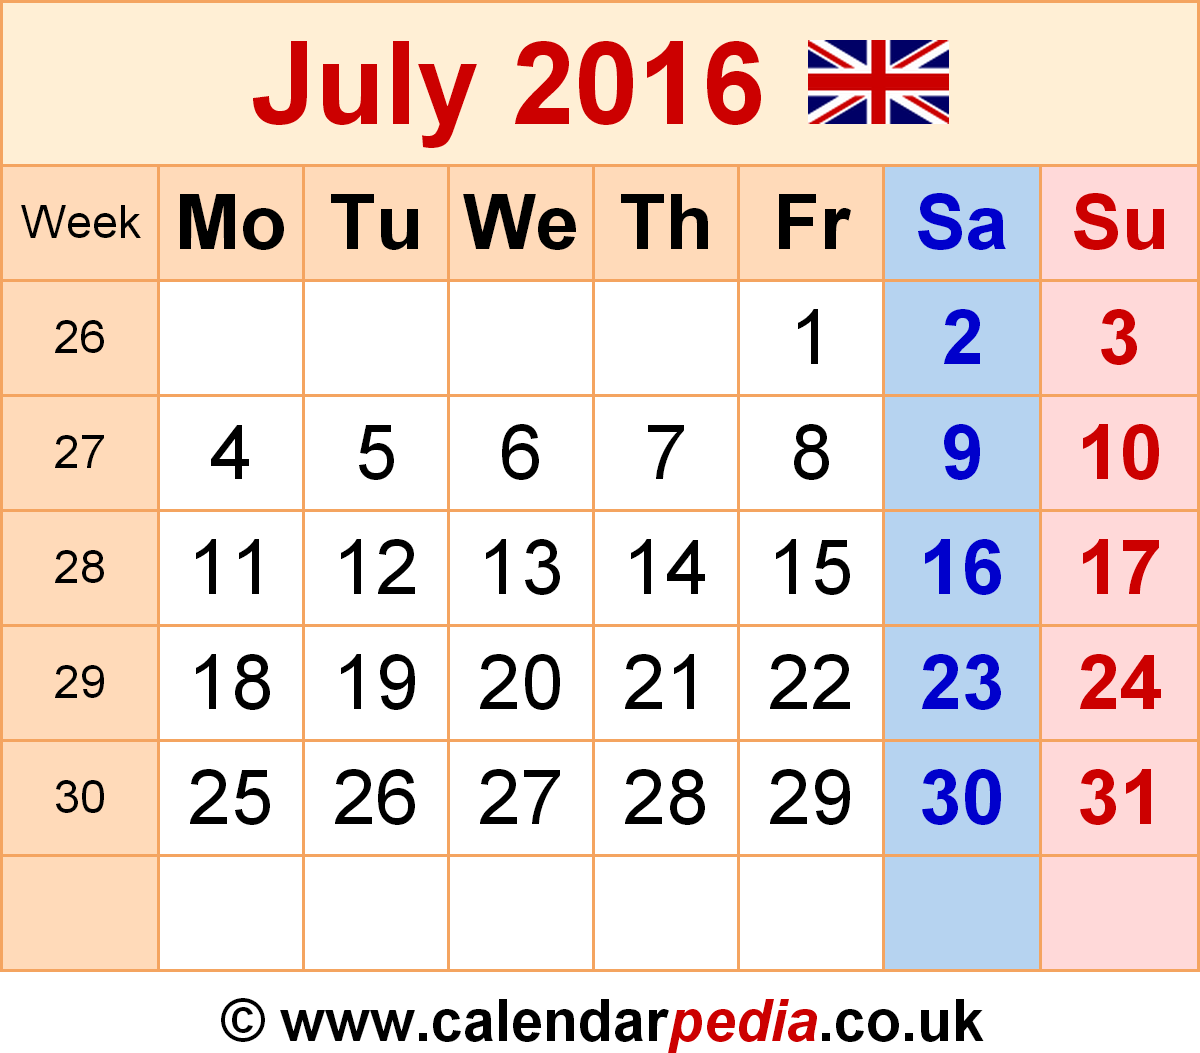 Calendar july 2016 clipart jpg black and white stock July 2016 calendar sporty clipart - ClipartFest jpg black and white stock